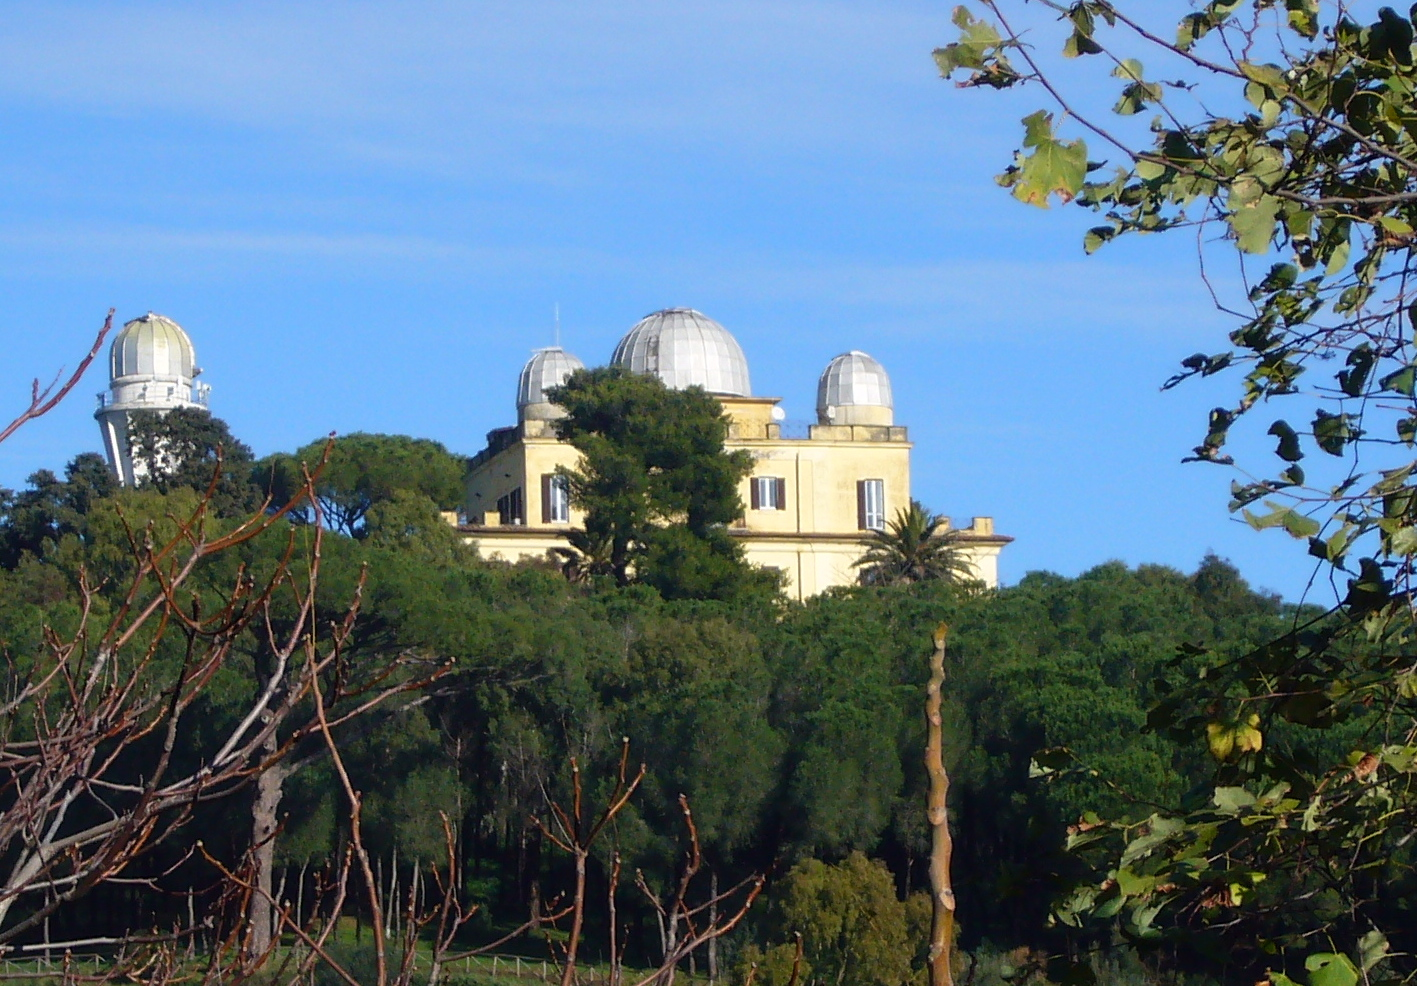 InterNations Expat Blog_Founder's Diary Rome B_Pic 2